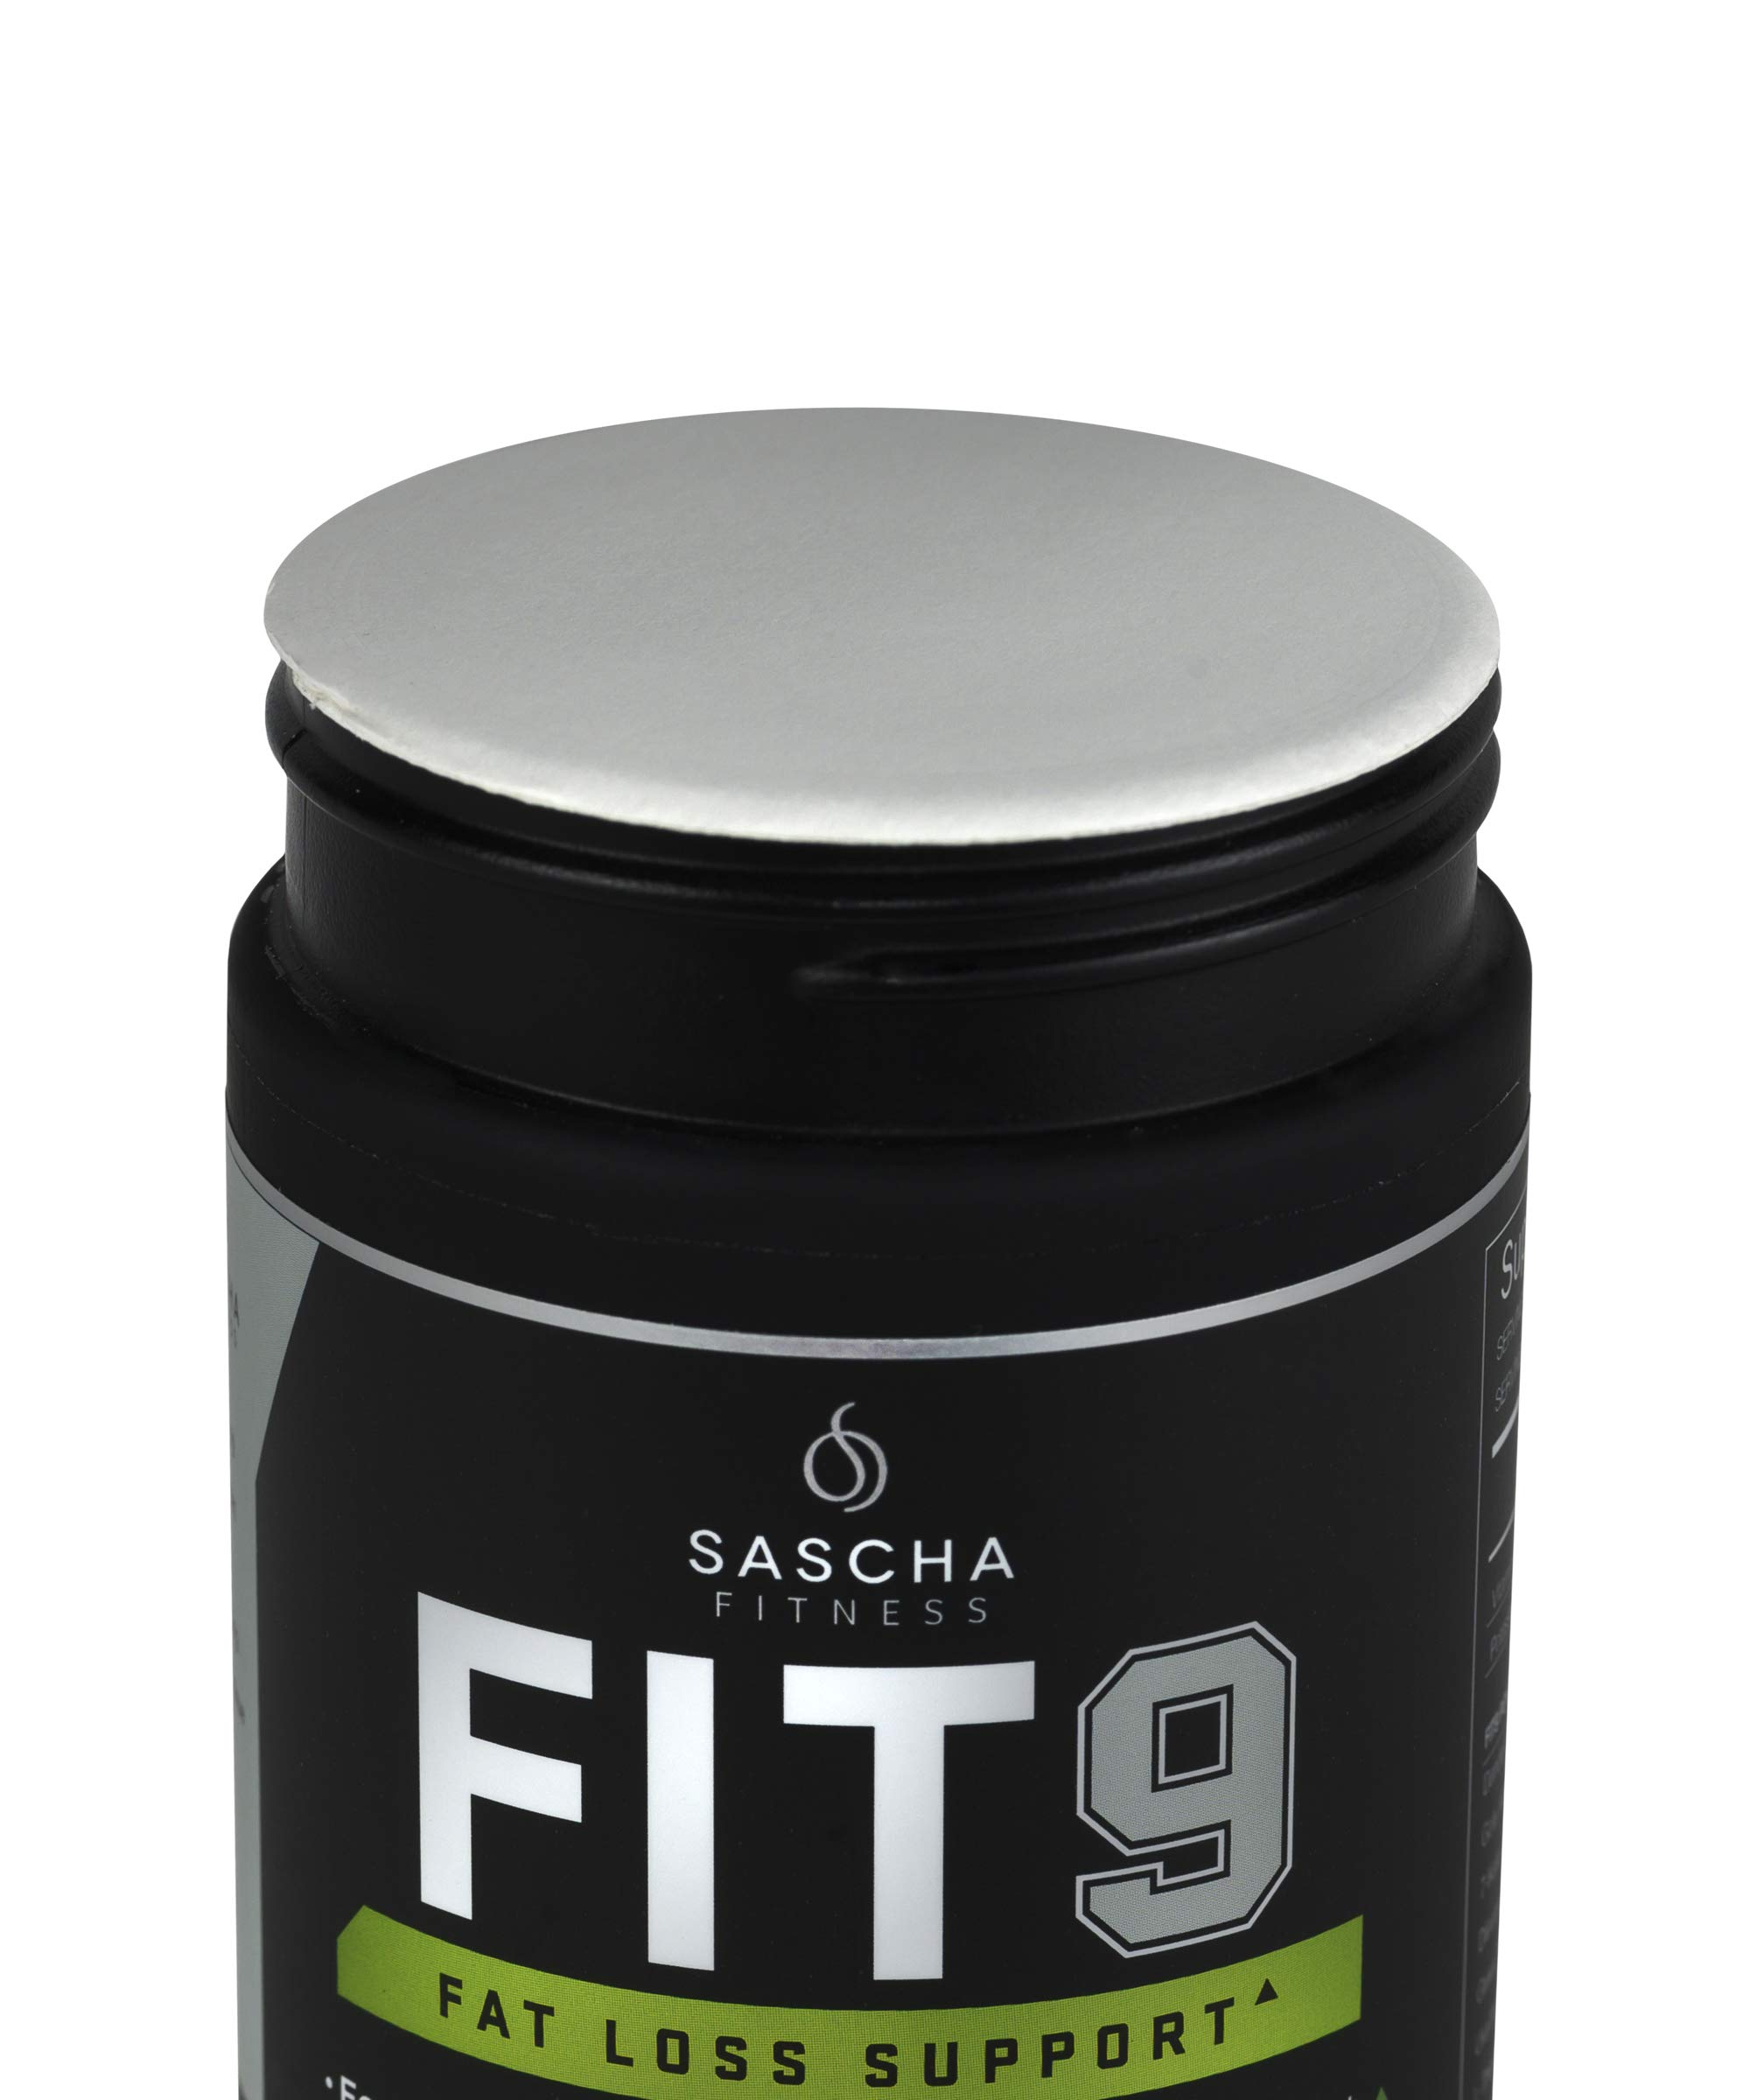 Sascha Fitness Fat Loss pills | Collagen support | Fluid Balance | FIT9 Ingredients: 7Keto + Uva Ursi, Gotu Kola, L-Theanine,Gingko Biloba,DIM,Green Tea | Weight Loss Supplements-Vegan-120 Natural Cap by SASCHA FITNESS (Image #5)